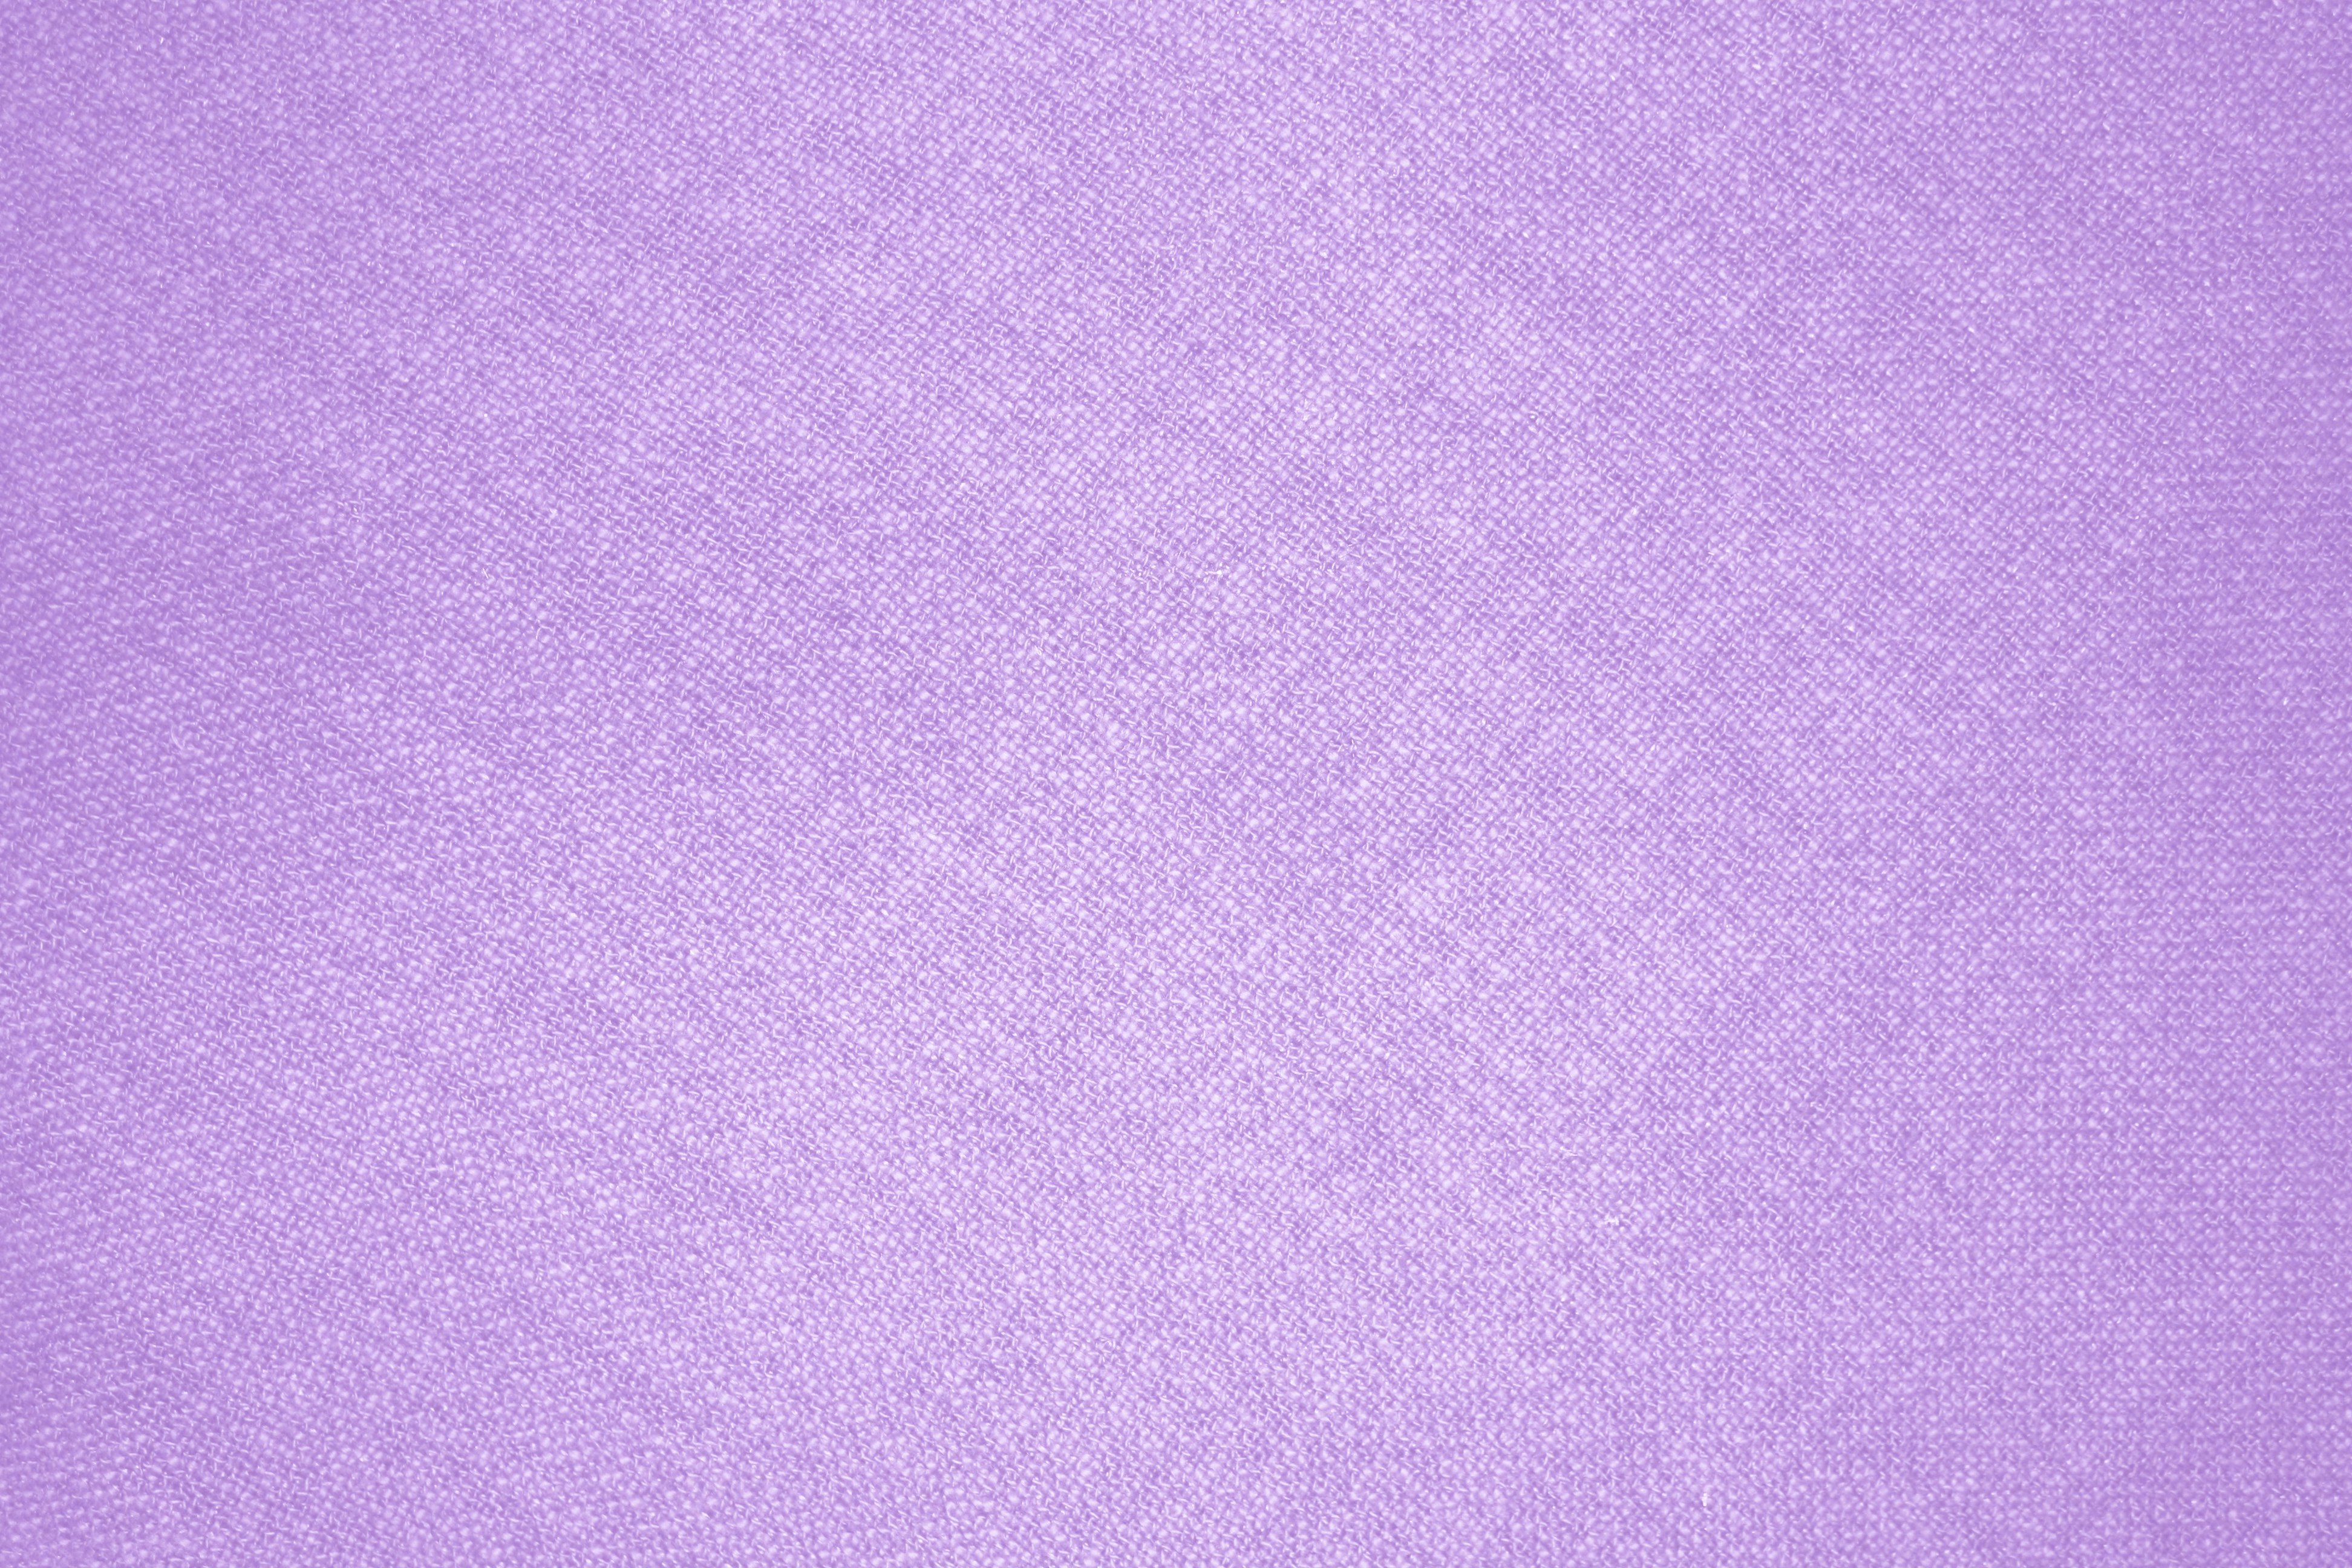 Lavender Fabric Texture Picture Free Photograph Photos